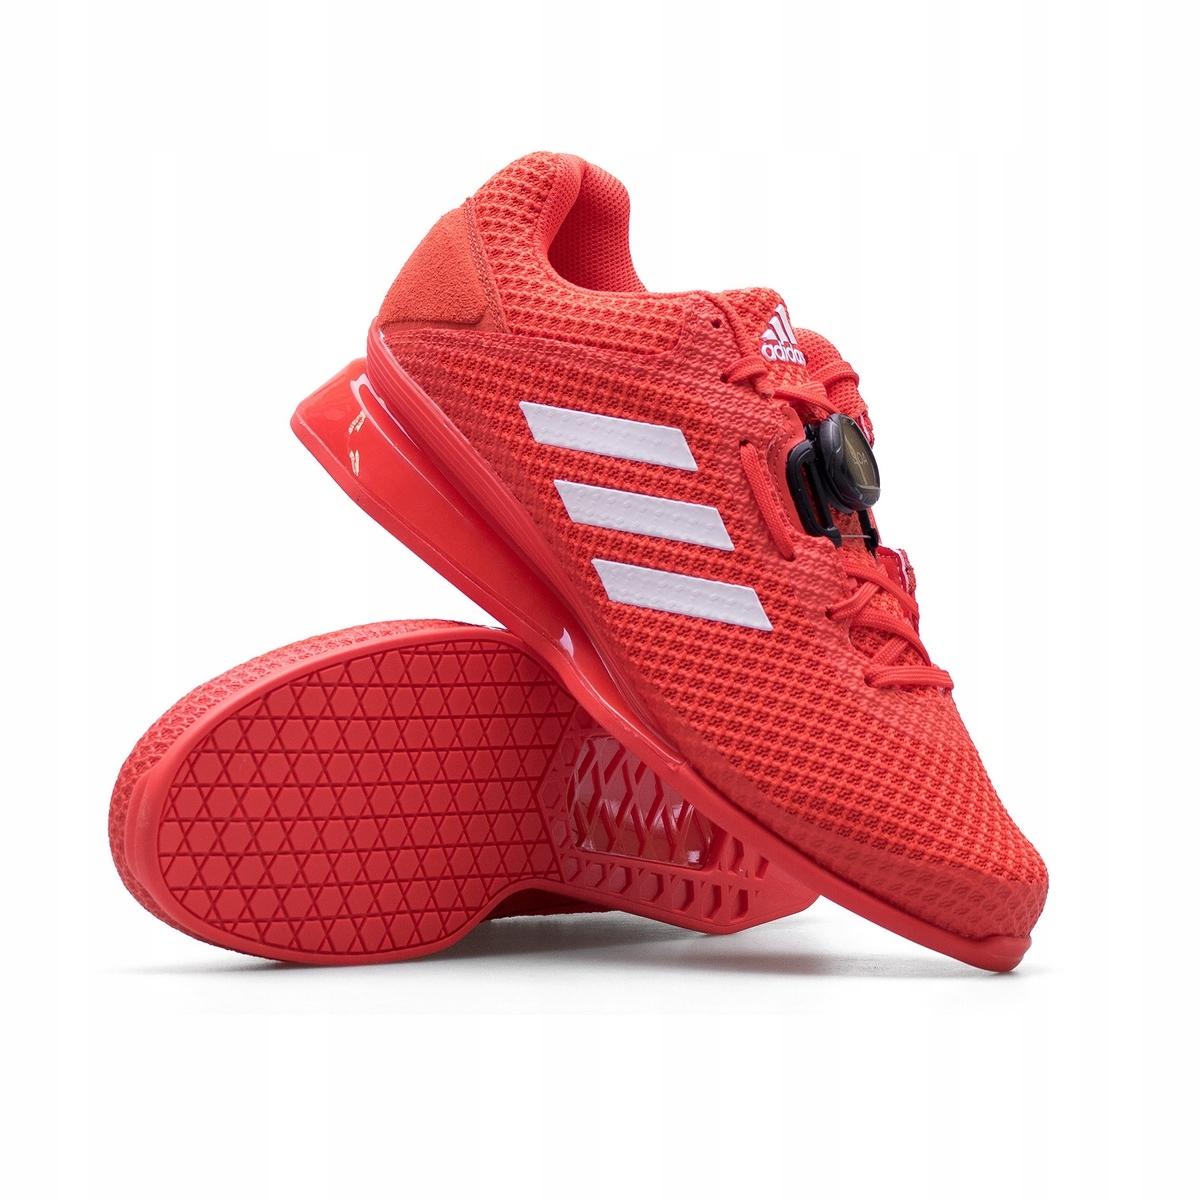 Groseramente Bienes dialecto  Adidas Leistung 1.6 II Red Weightlifting shoes   Sportheavy